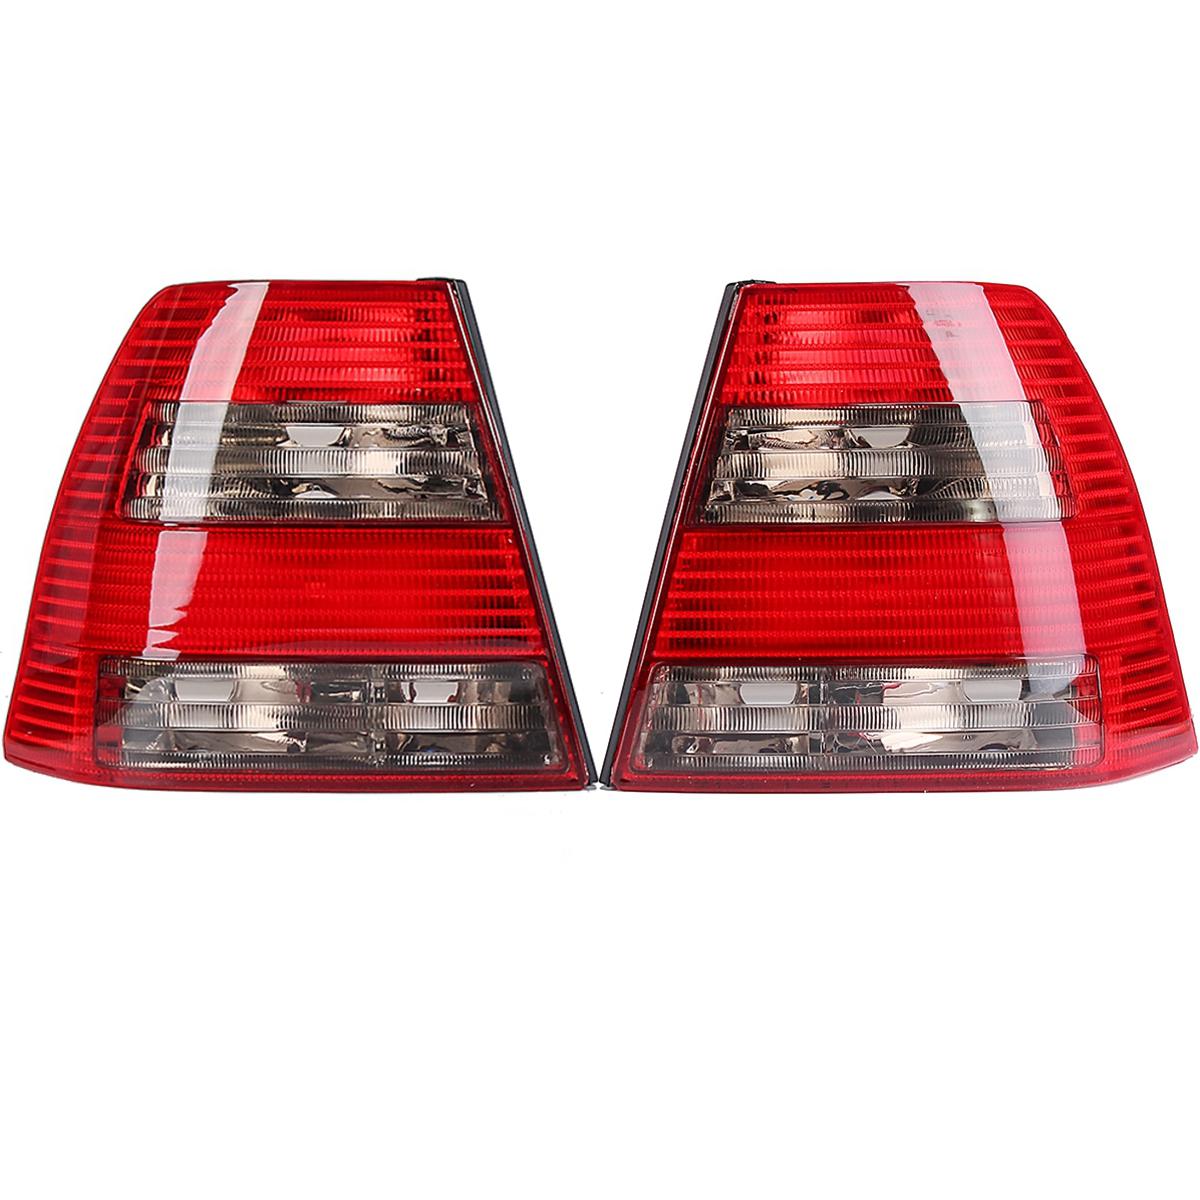 Пара Авто Задний фонарь Тормозная лампа Лампа Красный 401341673737 для VW Jetta / Bora MK4 Седан - фото 1